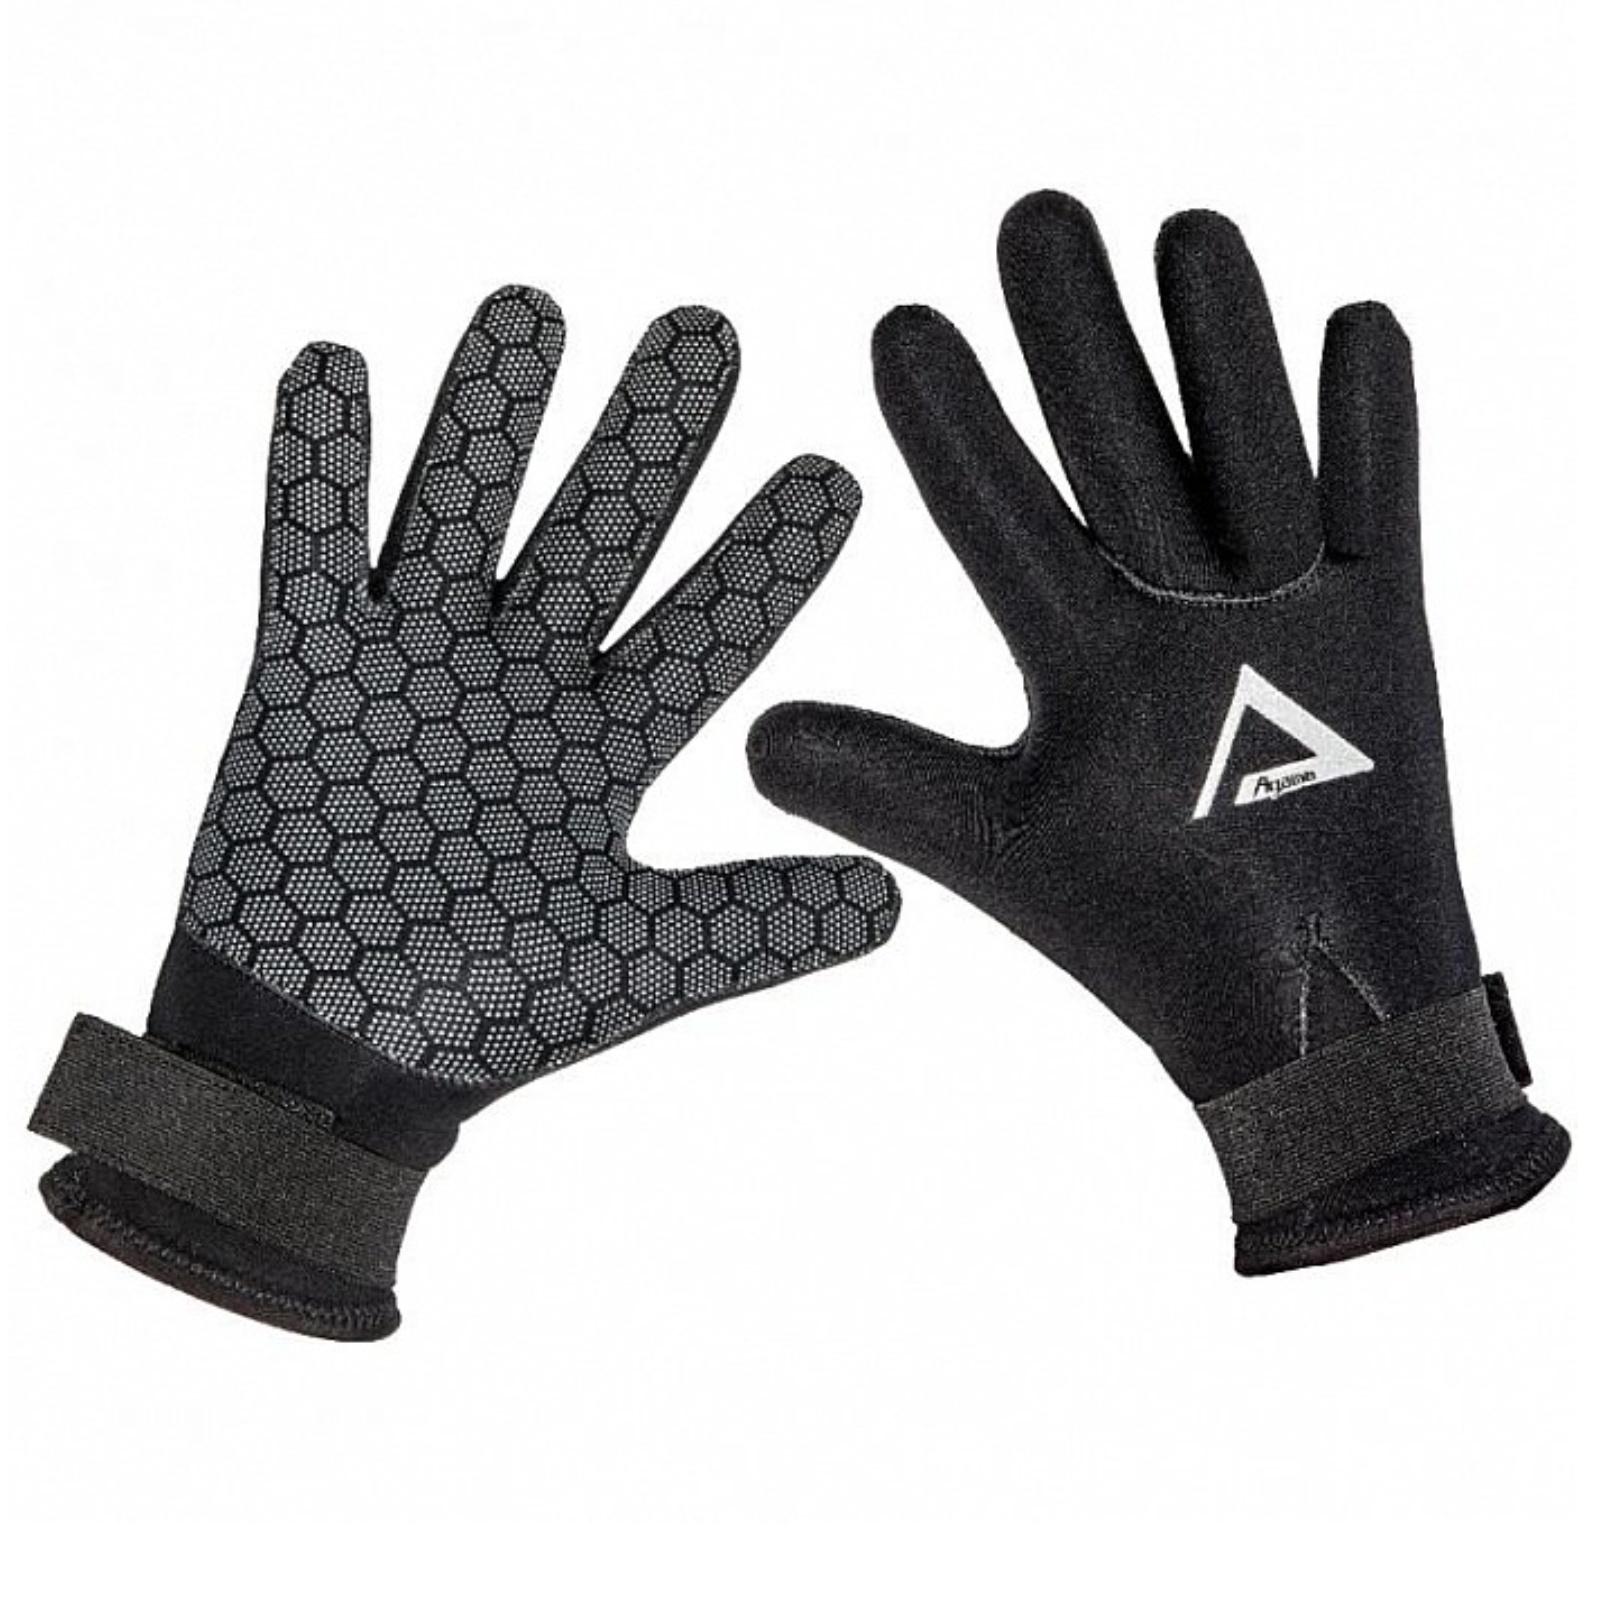 Neoprenové rukavice AGAMA Superstretch 5 mm - vel. S